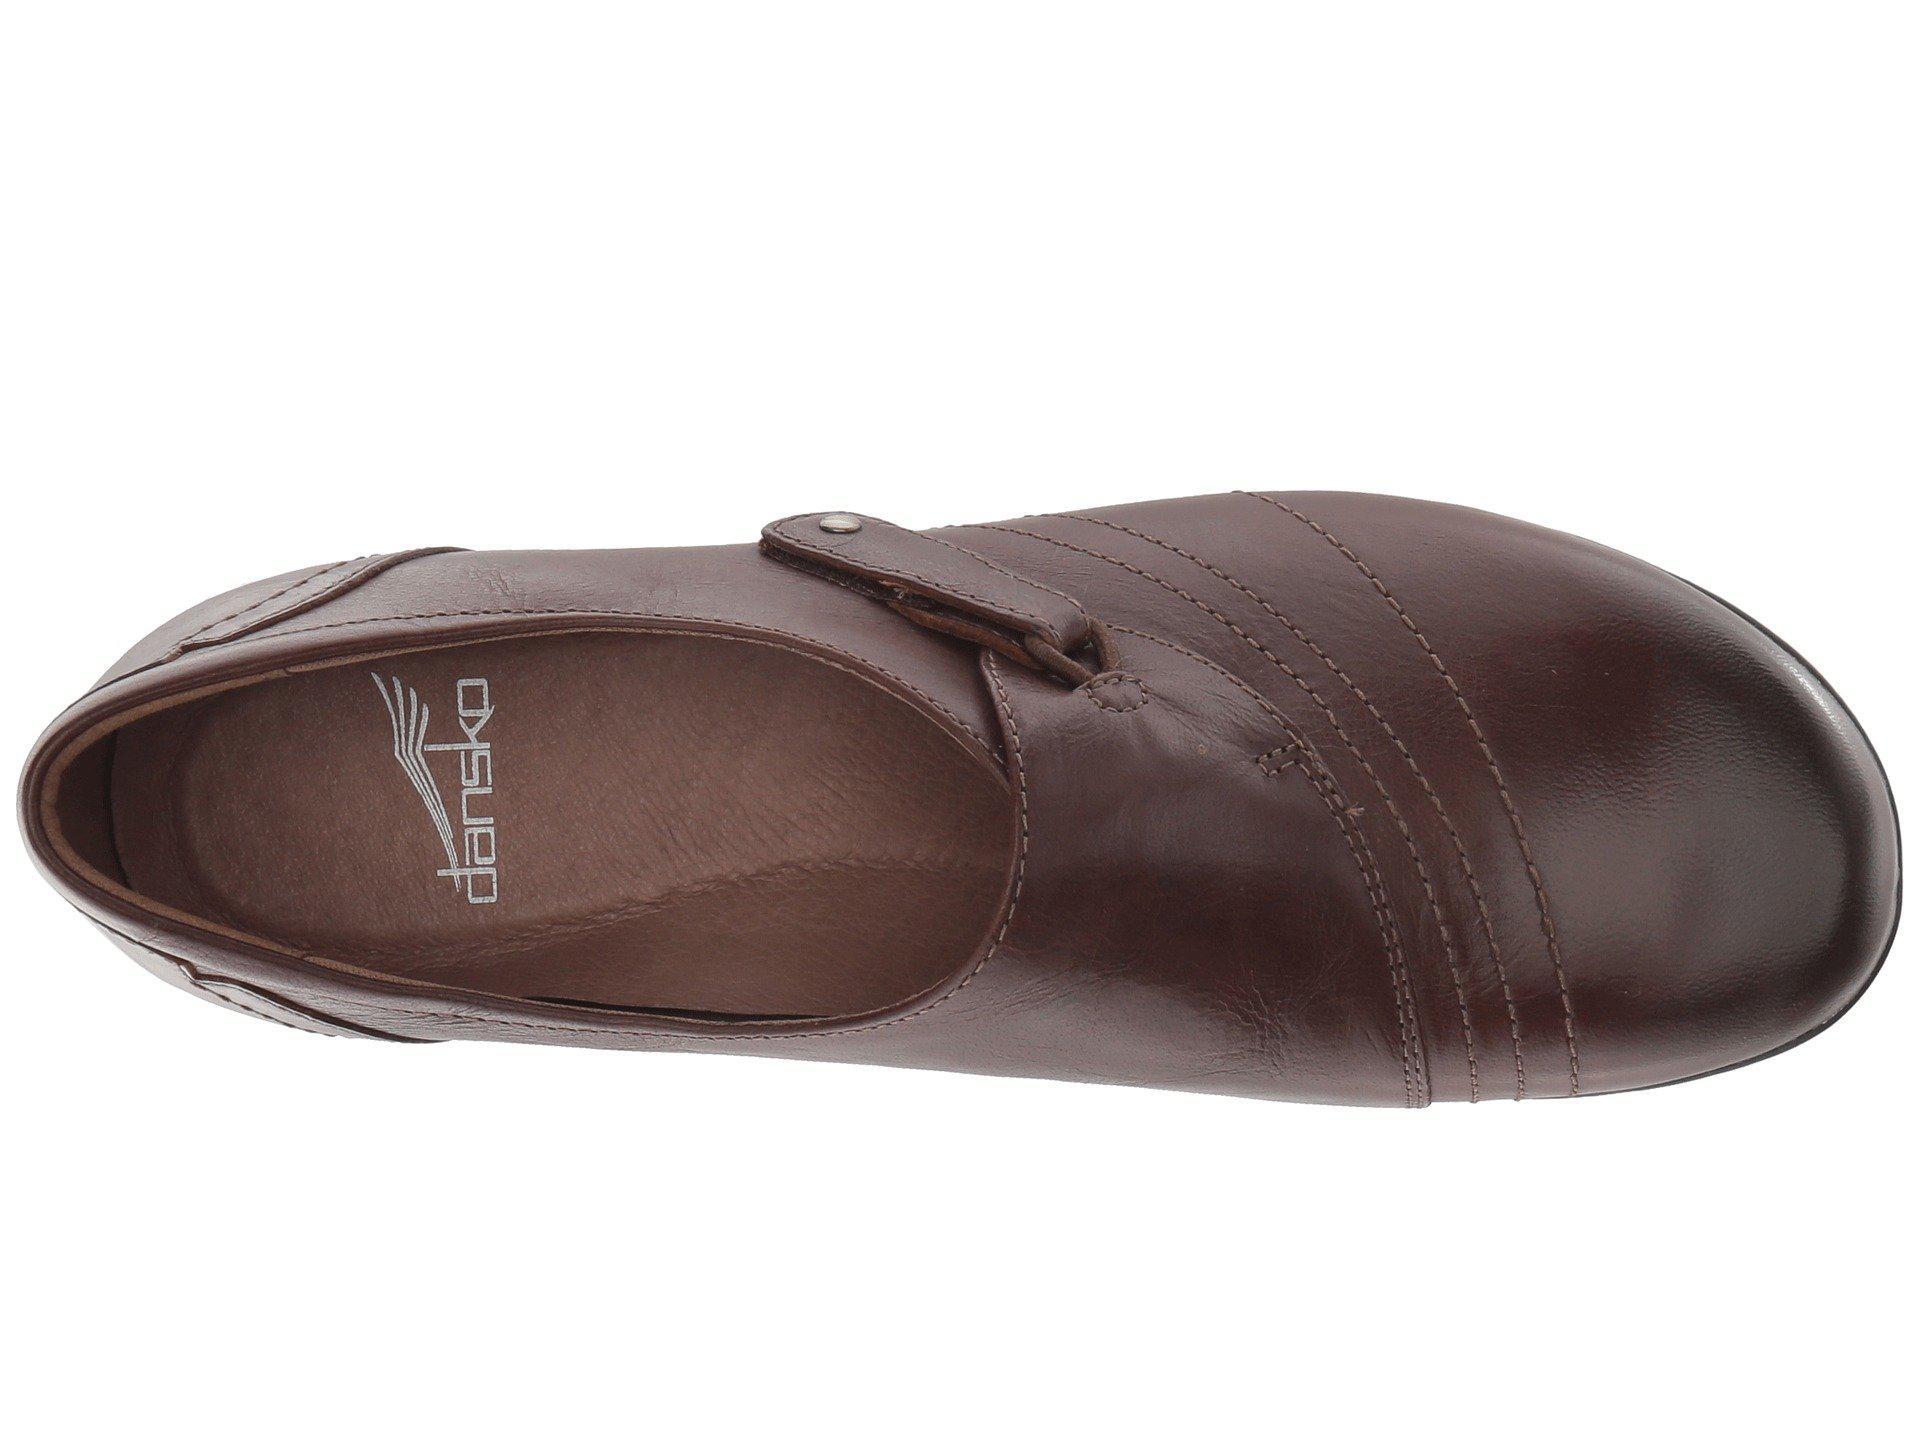 90b1077eee2 Dansko - Brown Franny (chocolate Burnished Calf) Women s Shoes - Lyst. View  fullscreen